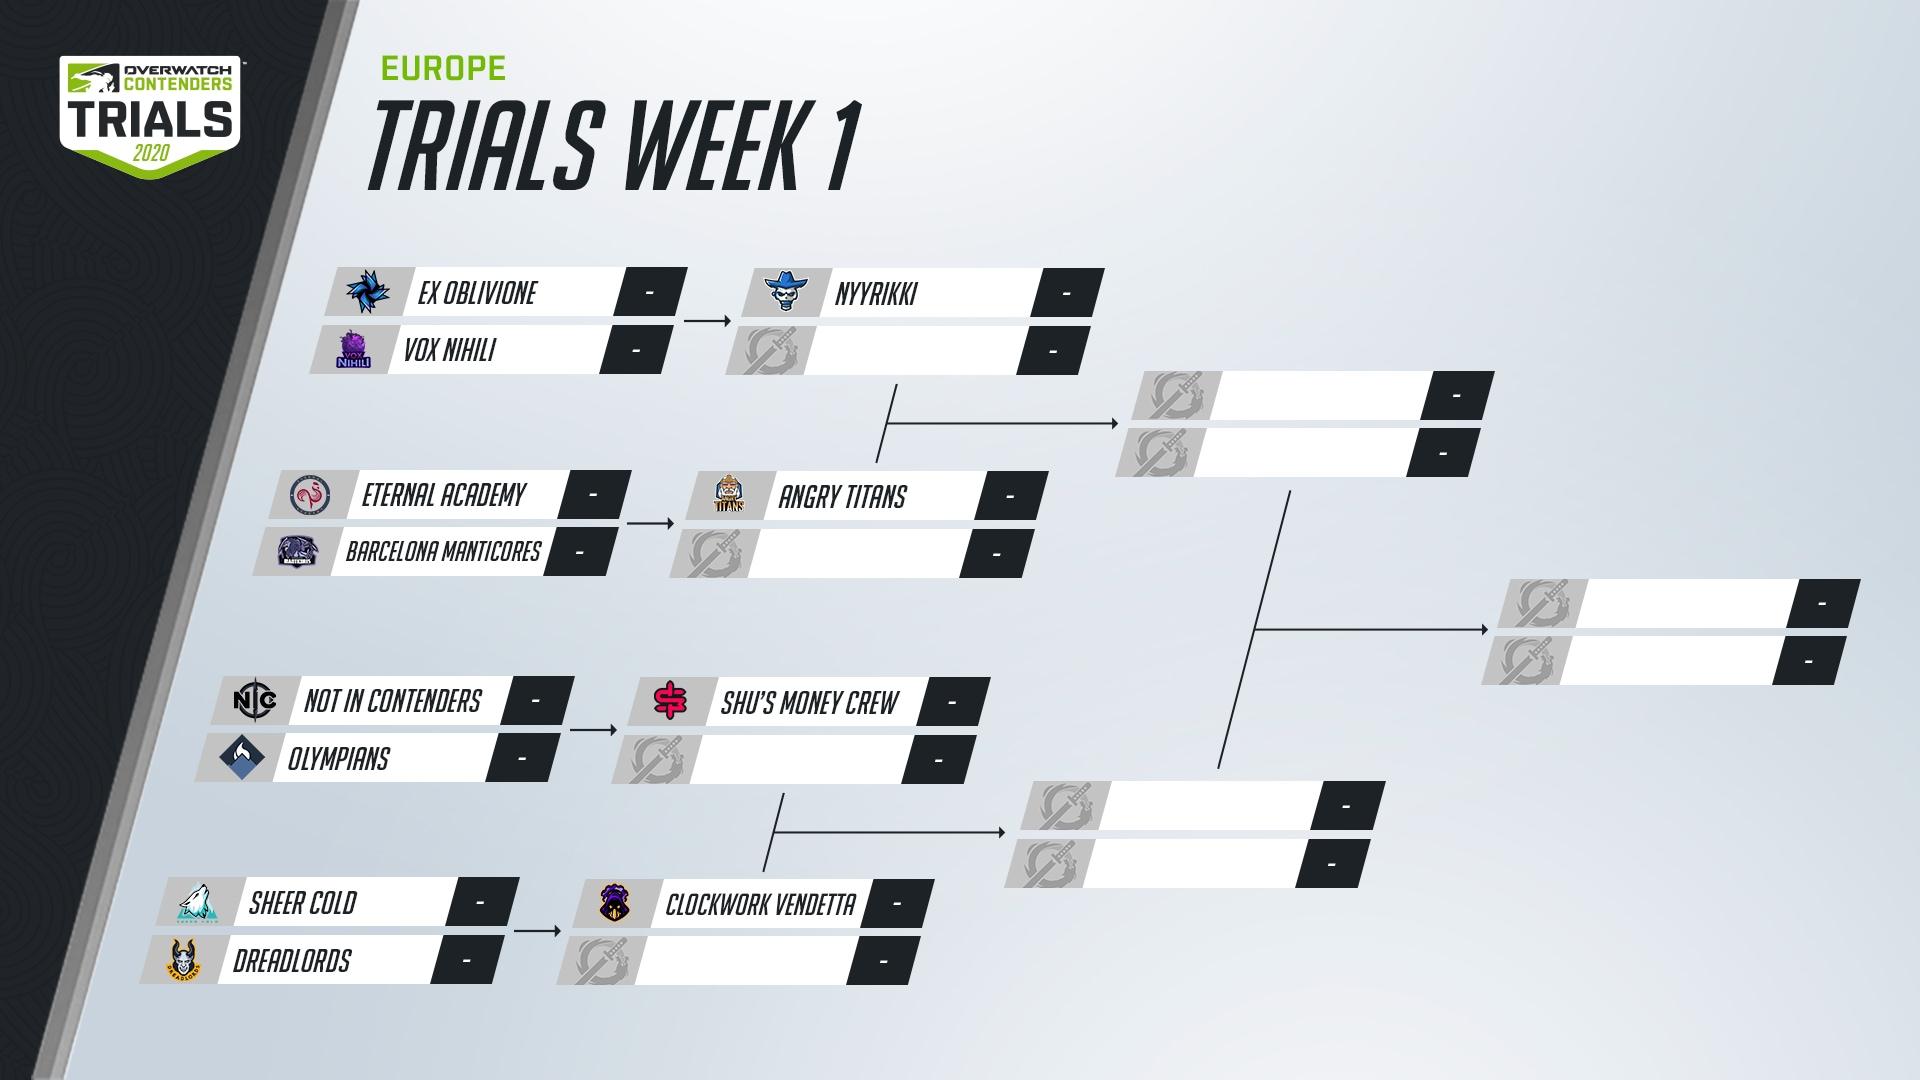 OW-Contenders_Brackets_Trials-EU-Wk1.png